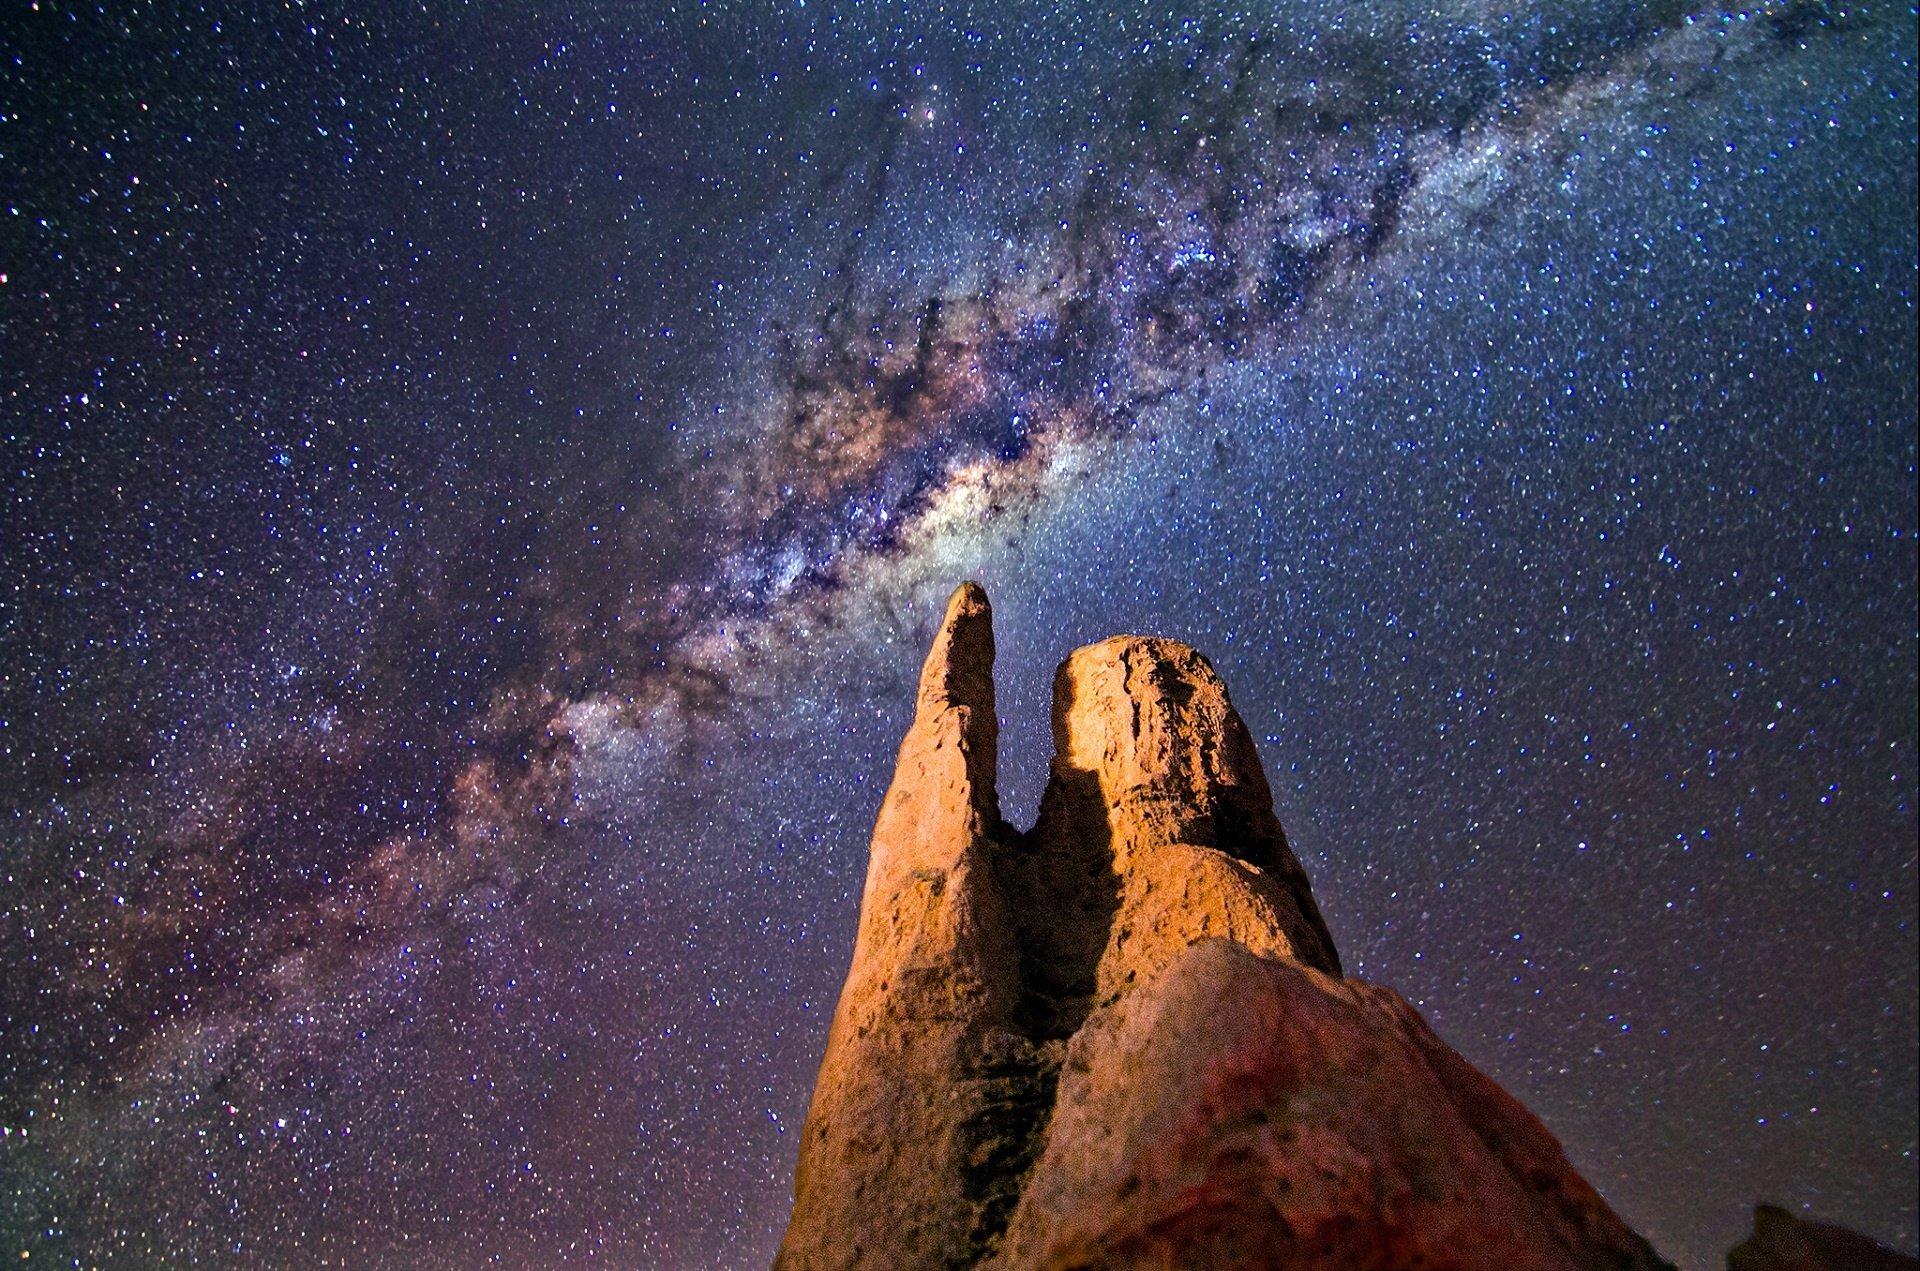 Sky Full of Stars - Photography Print